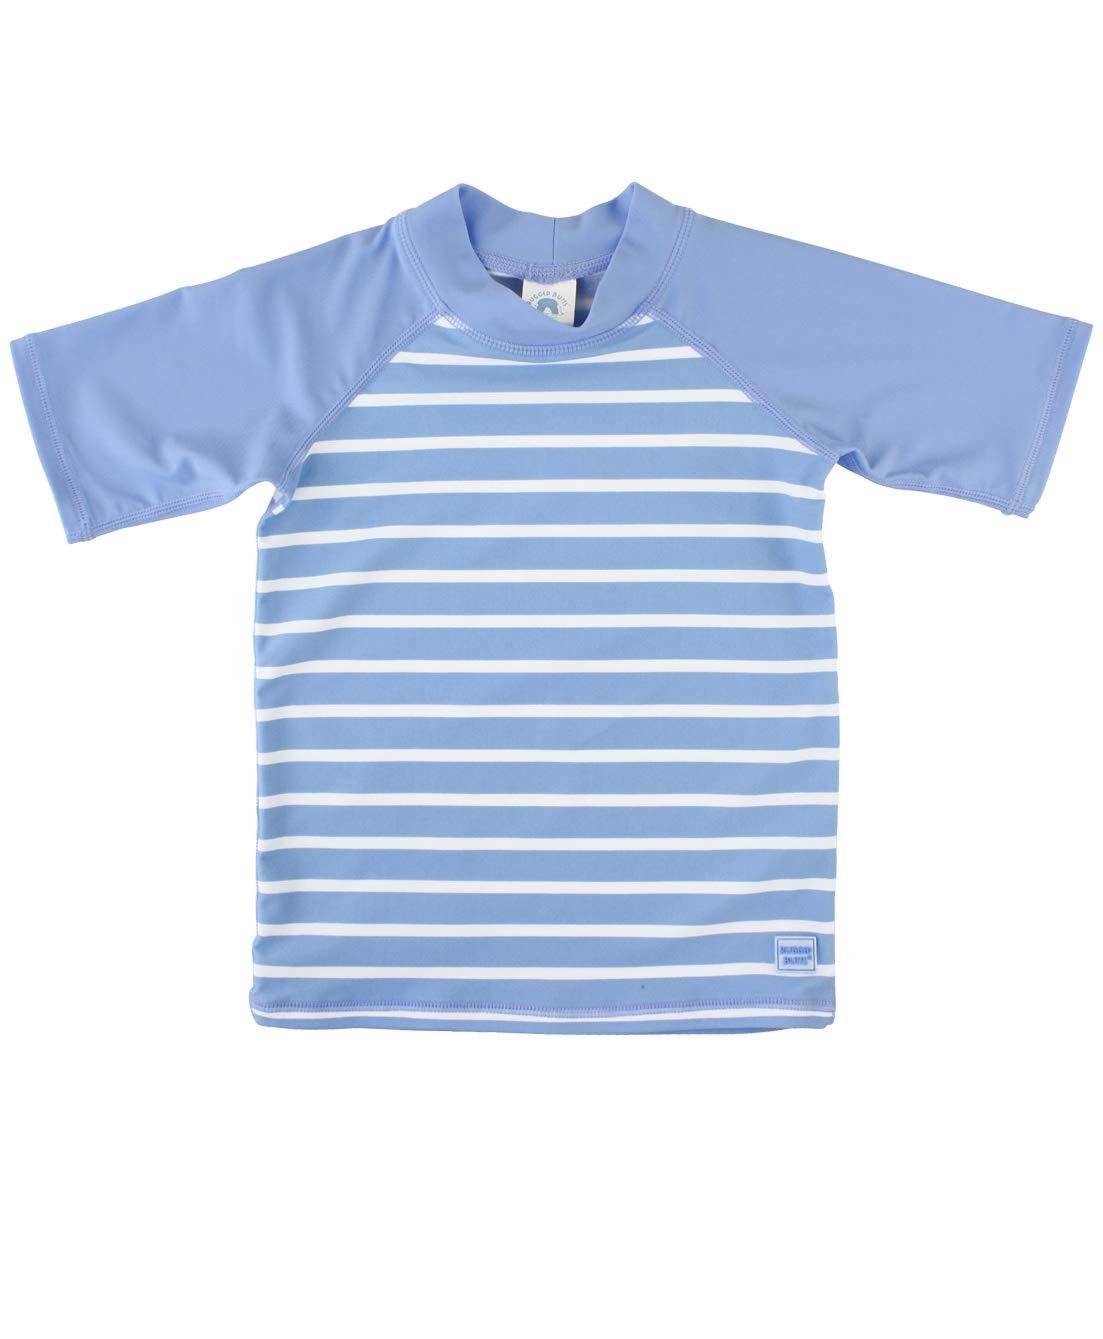 Baby Toddler Boy Rashguard Swim Shirt